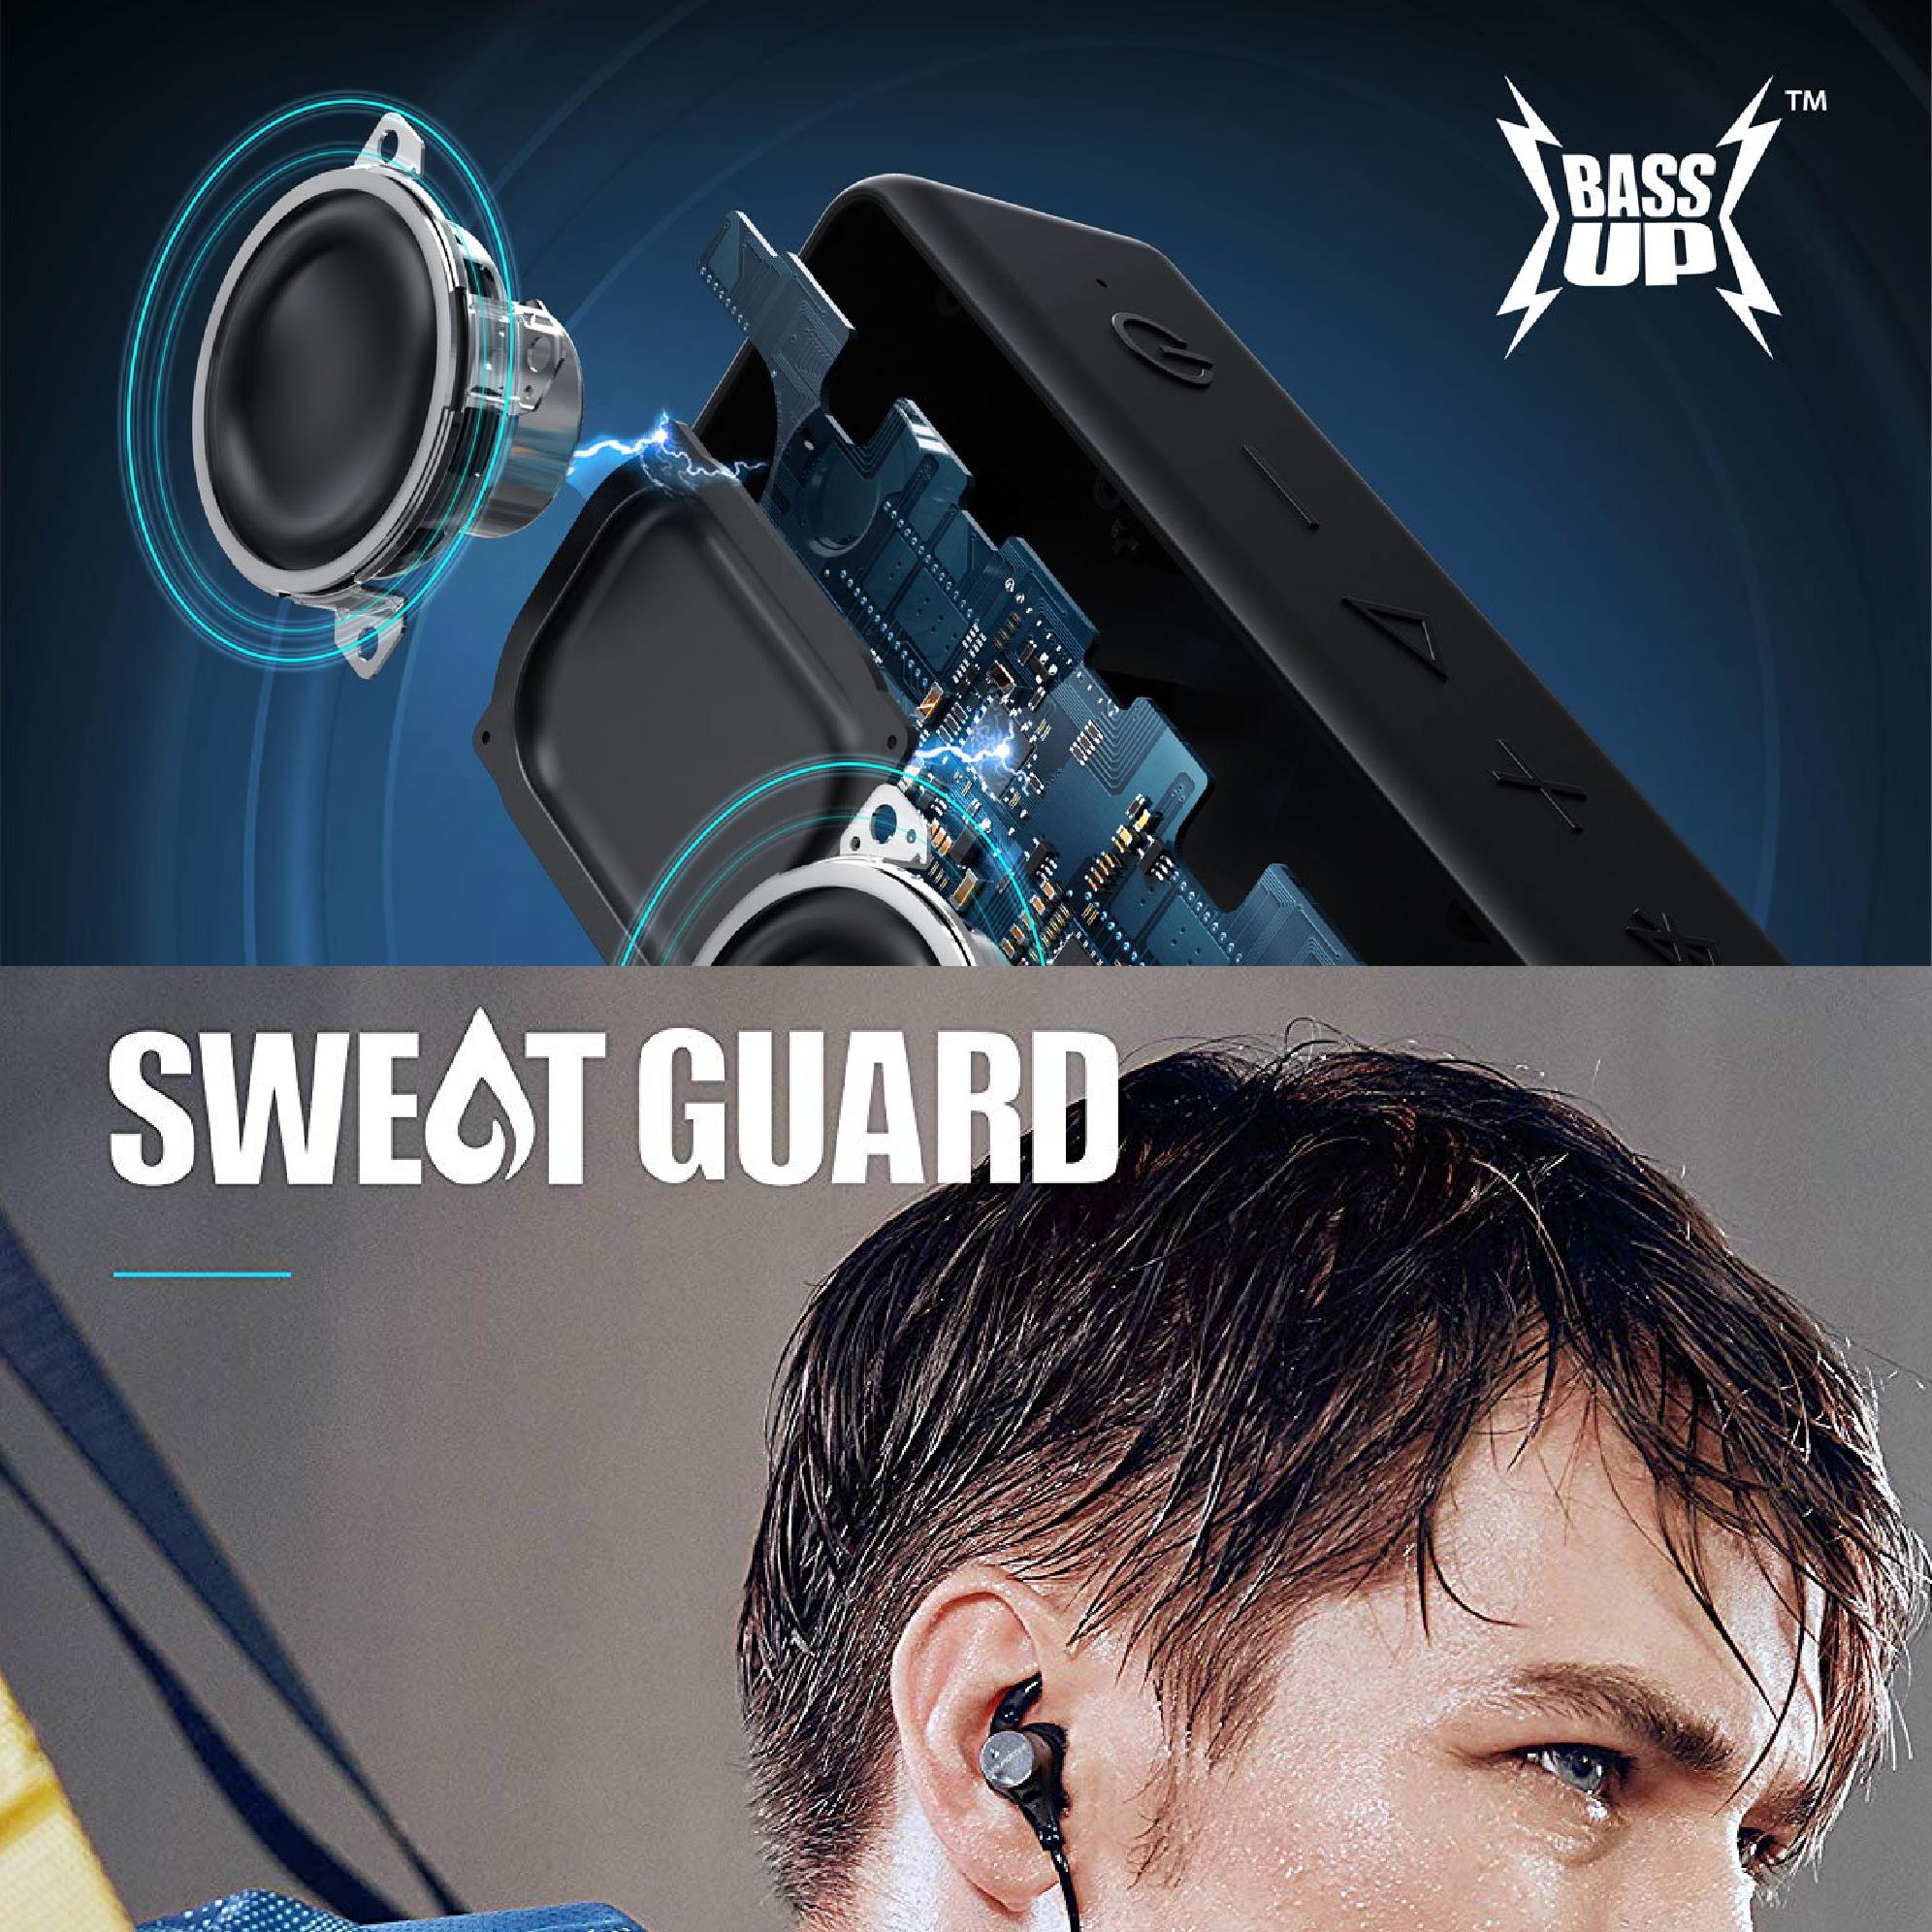 Anker音響副品牌 – SoundCore 搭戴的先進技術